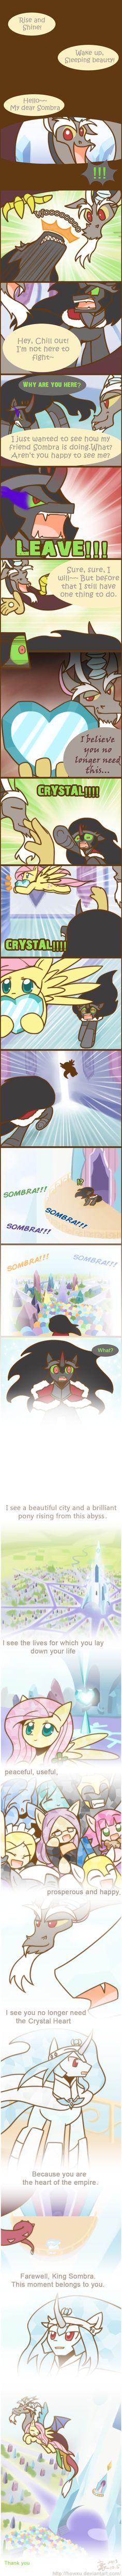 Reforming sequel Sombra by HowXu.deviantart.com on @deviantART